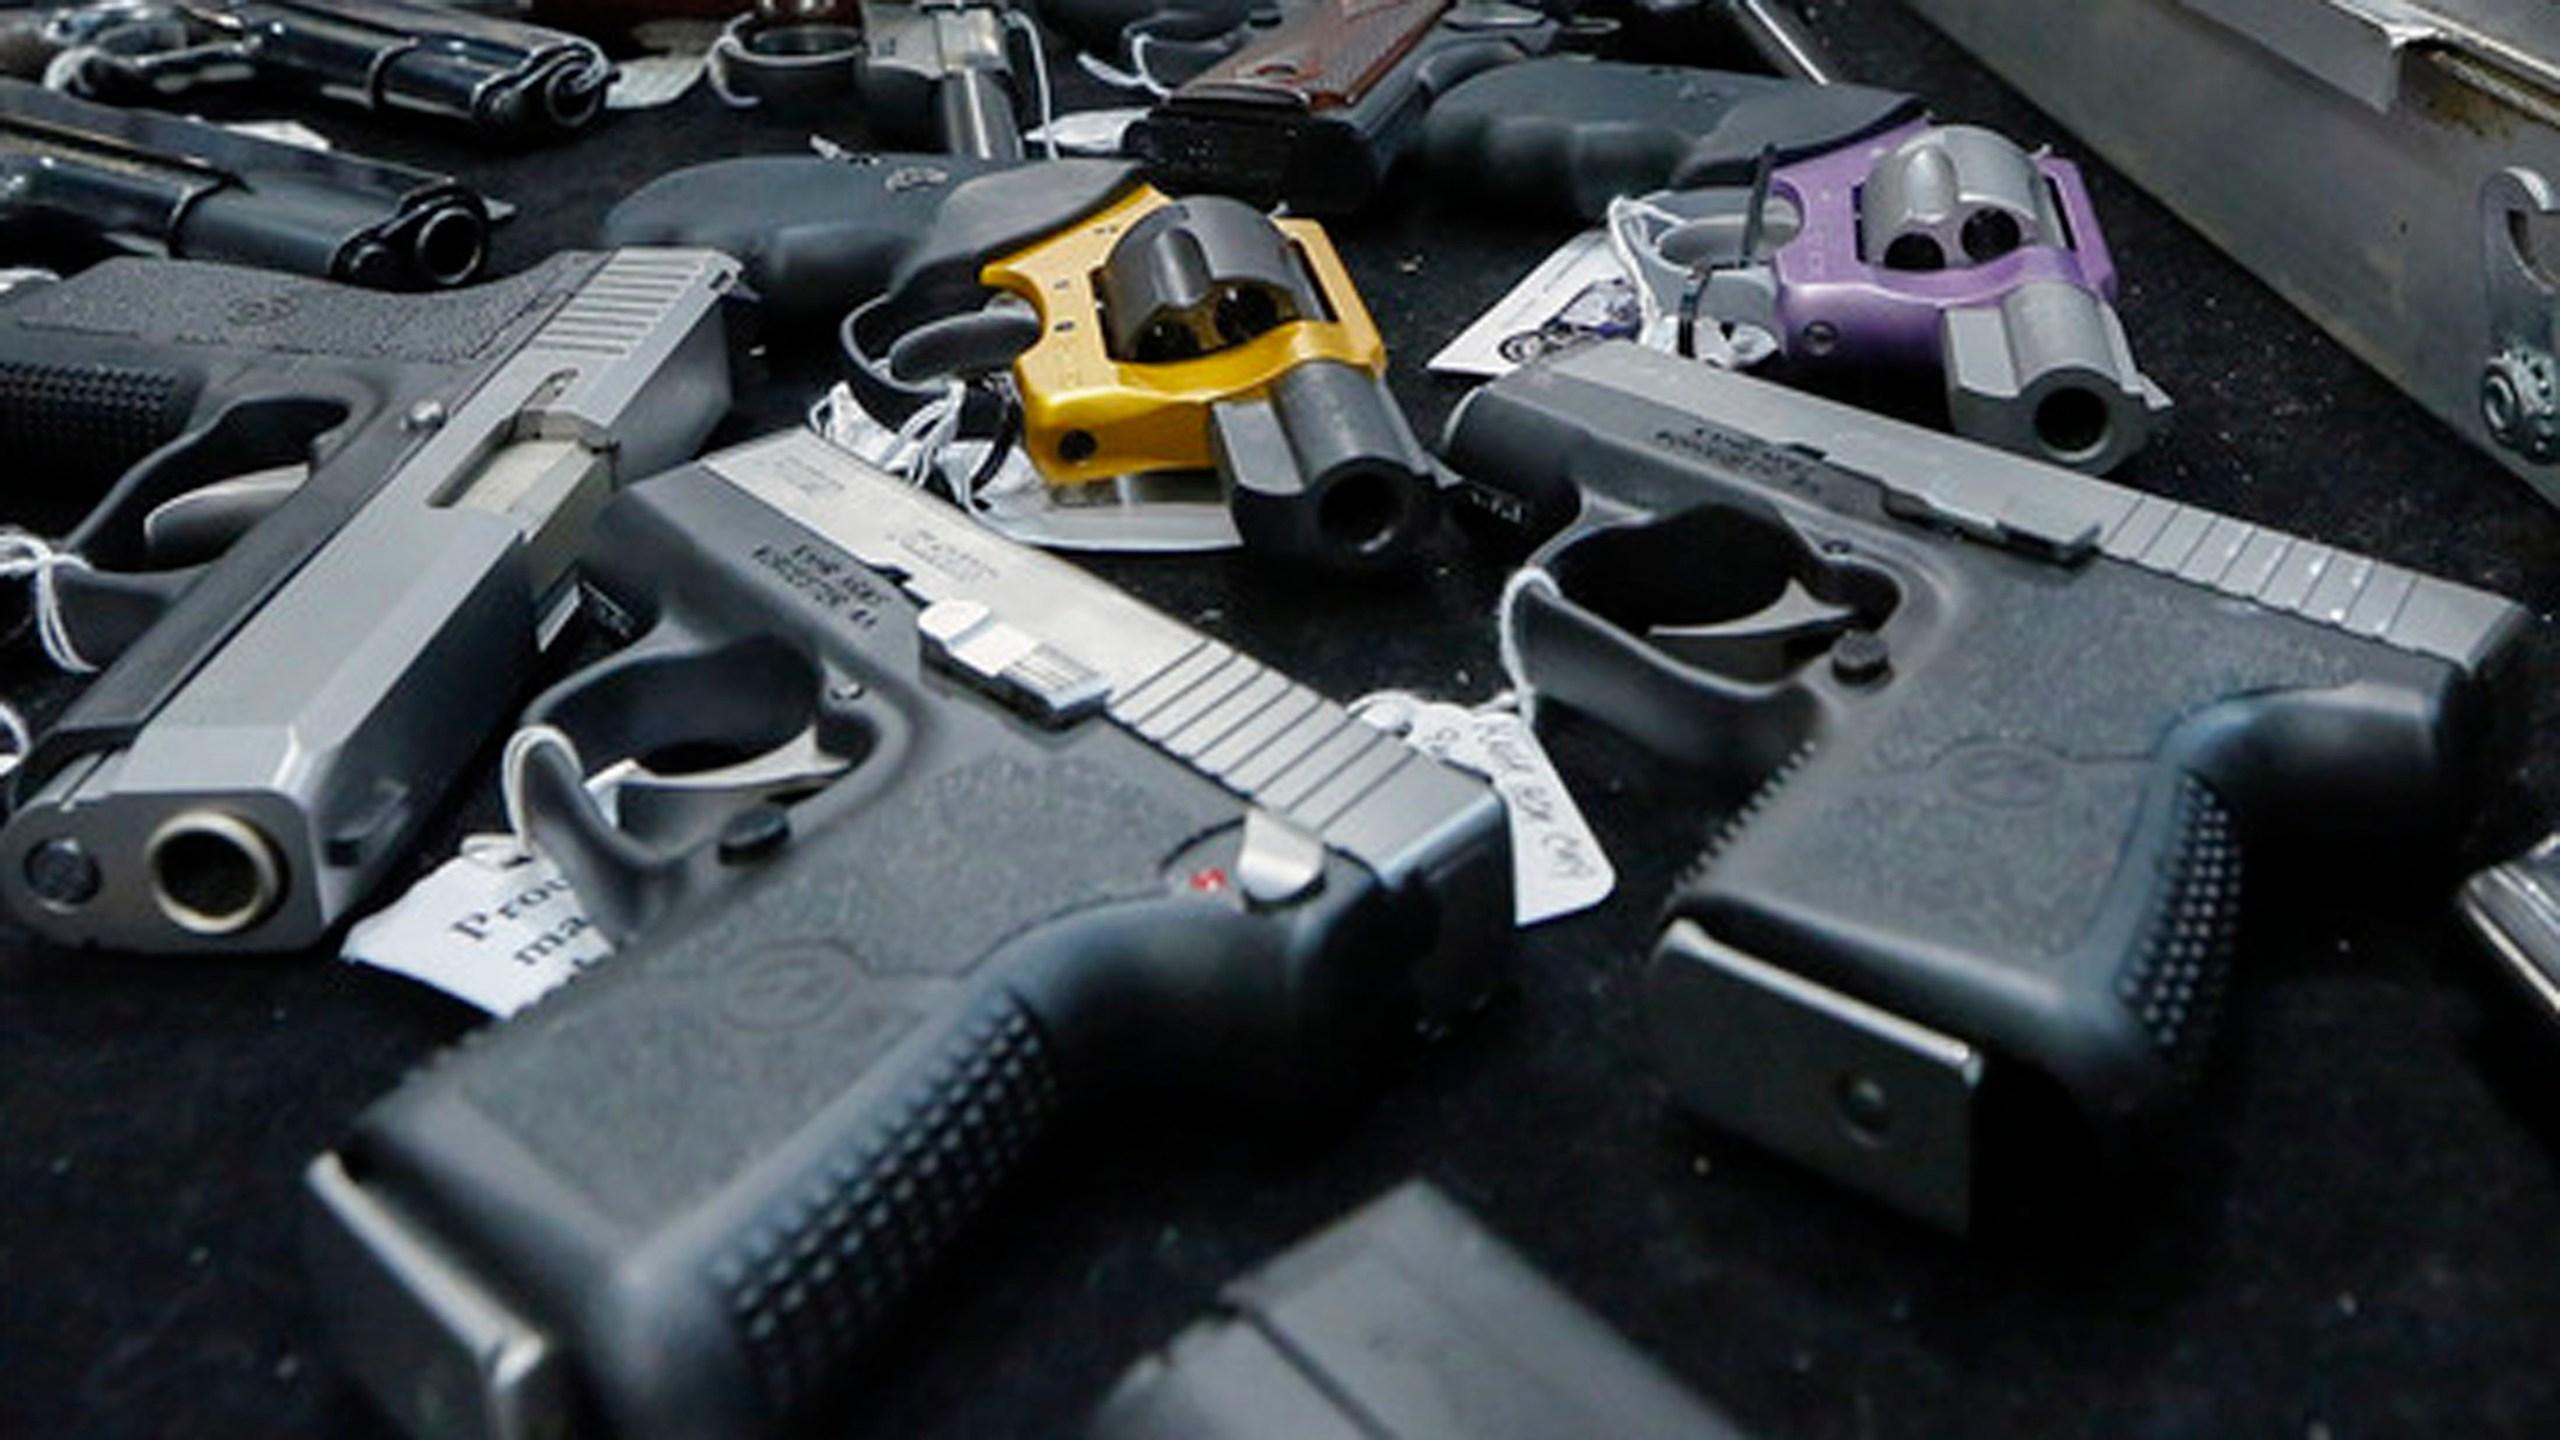 Guns file photo